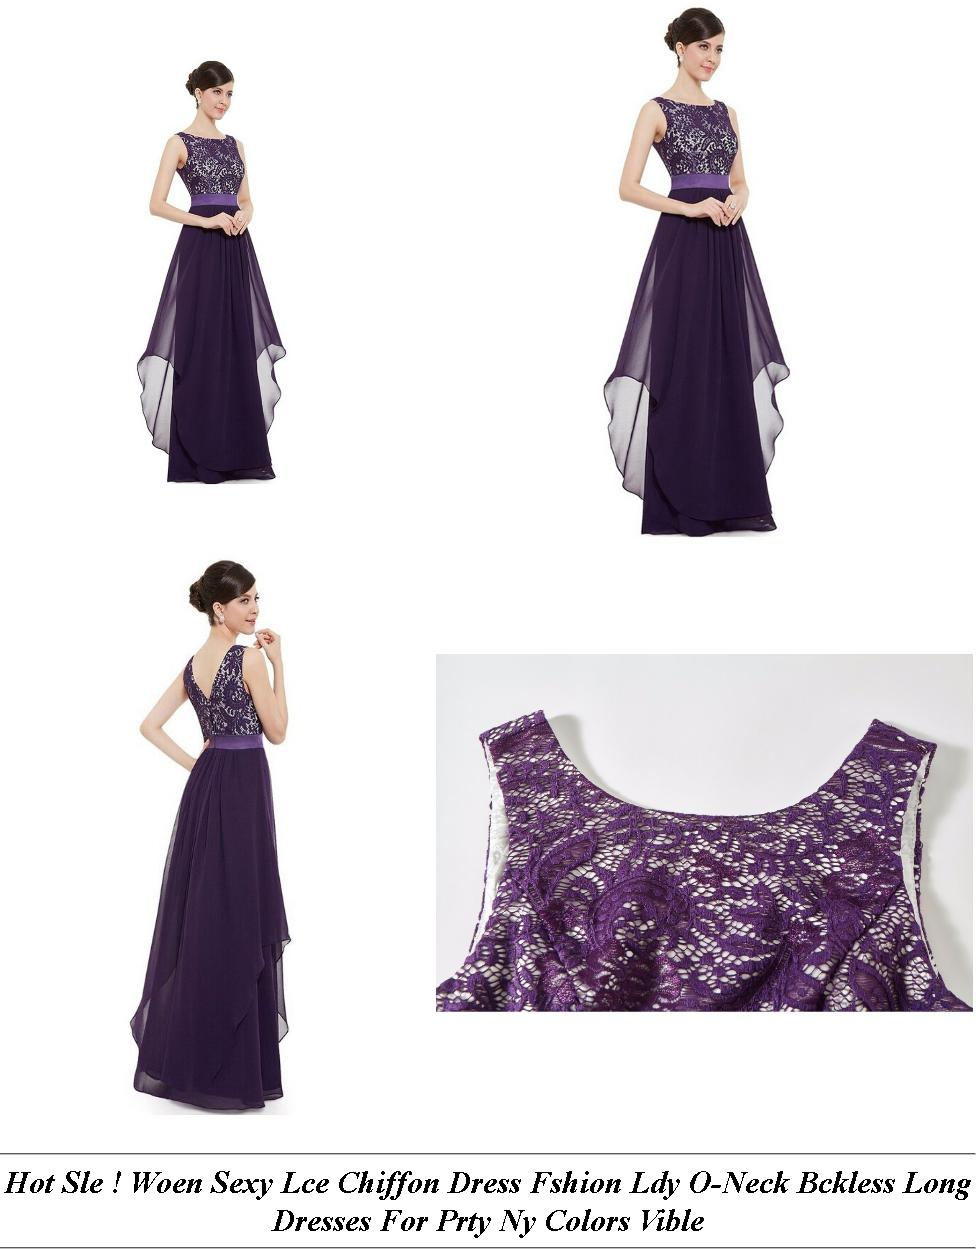 Plus Size Semi Formal Dresses - Summer Maxi Dresses On Sale - Midi Dress - Really Cheap Clothes Online Uk